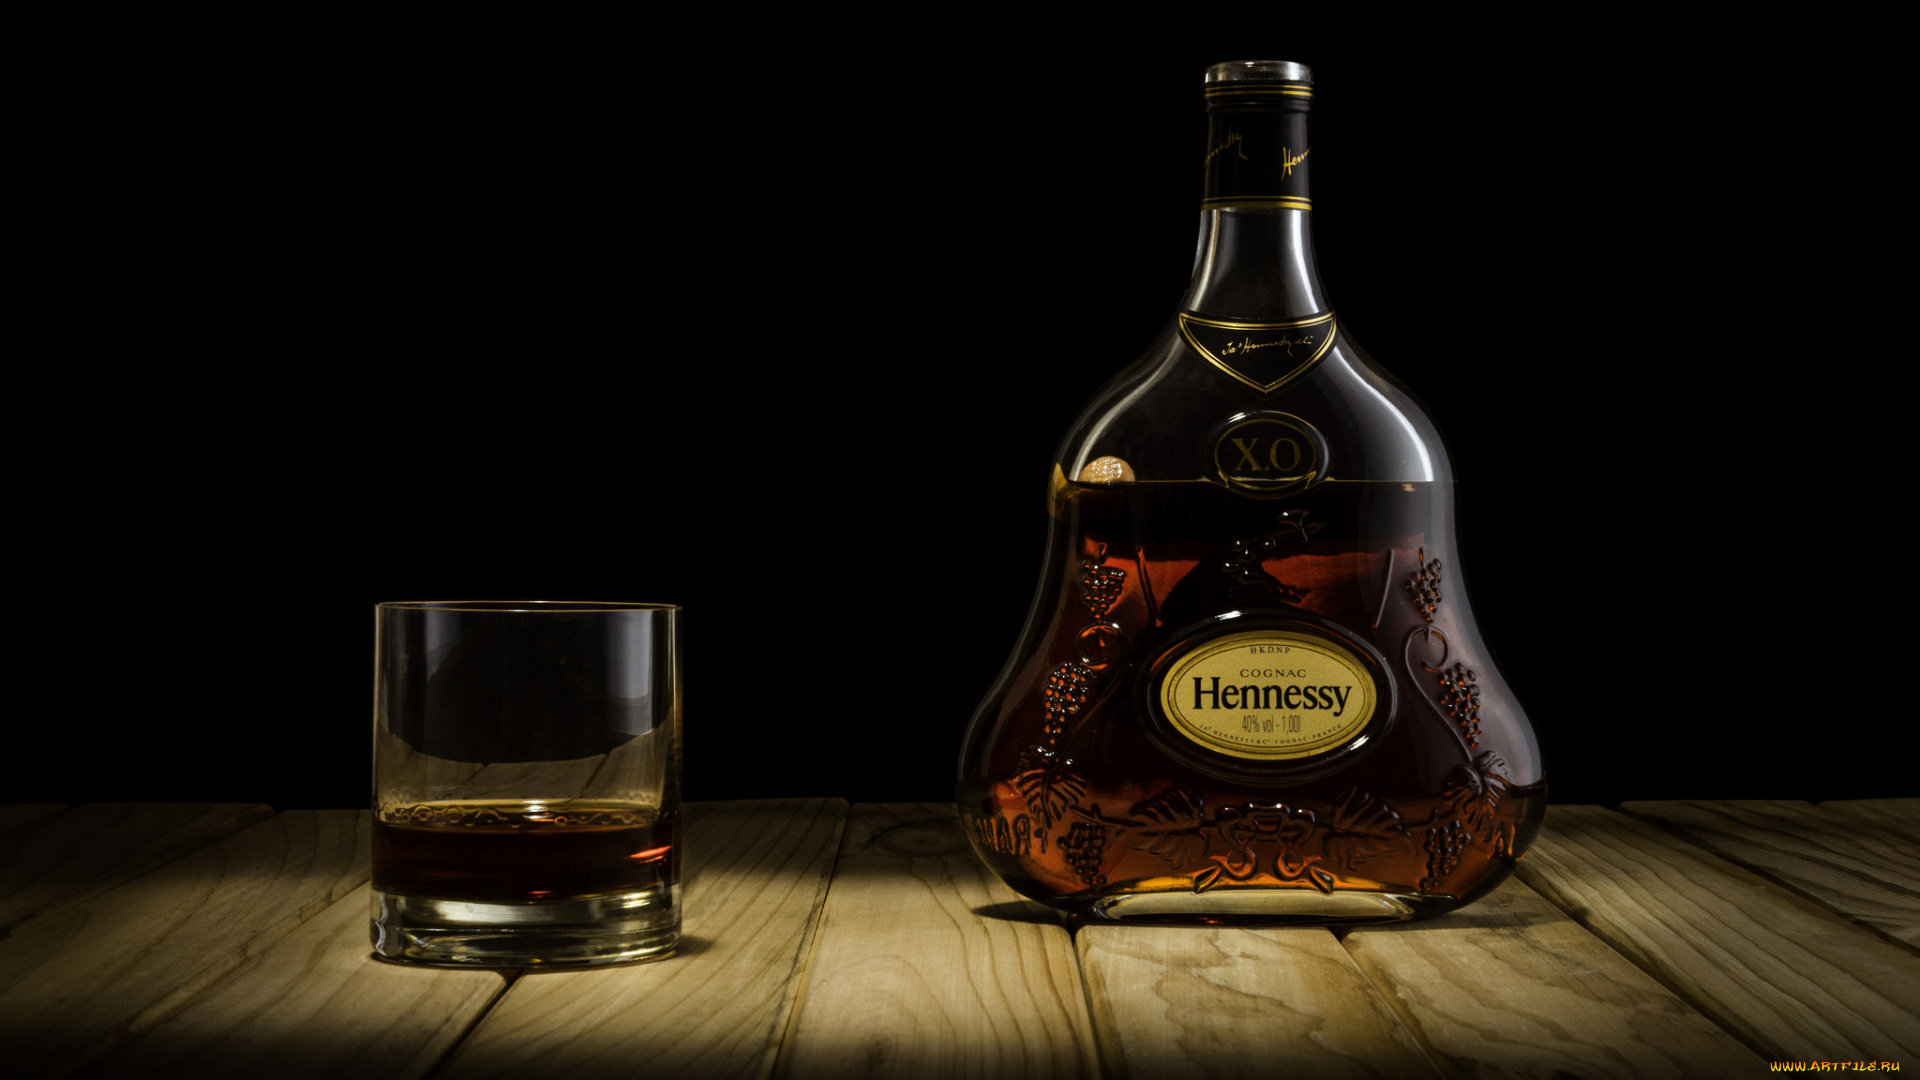 Бутылка Hennessy подборки